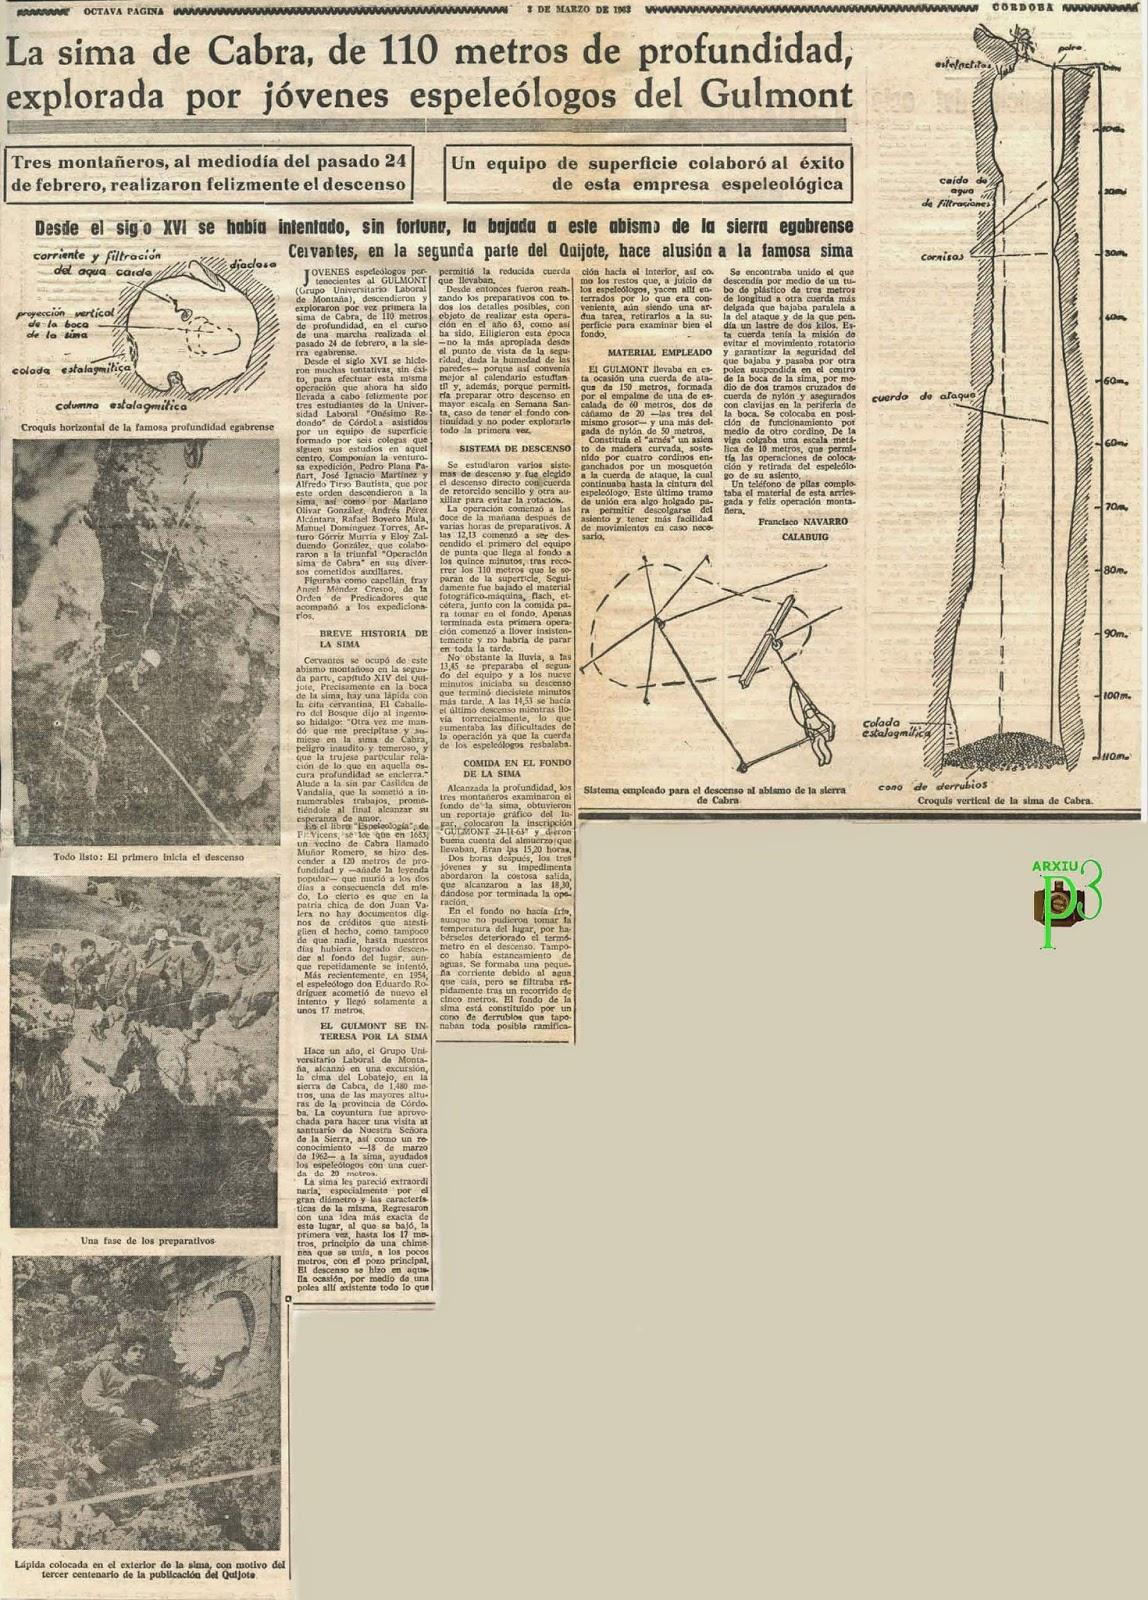 http://lasimadelgulmont.blogspot.com.es/2014/10/1963-operacionsima-de-cabra-principales.html